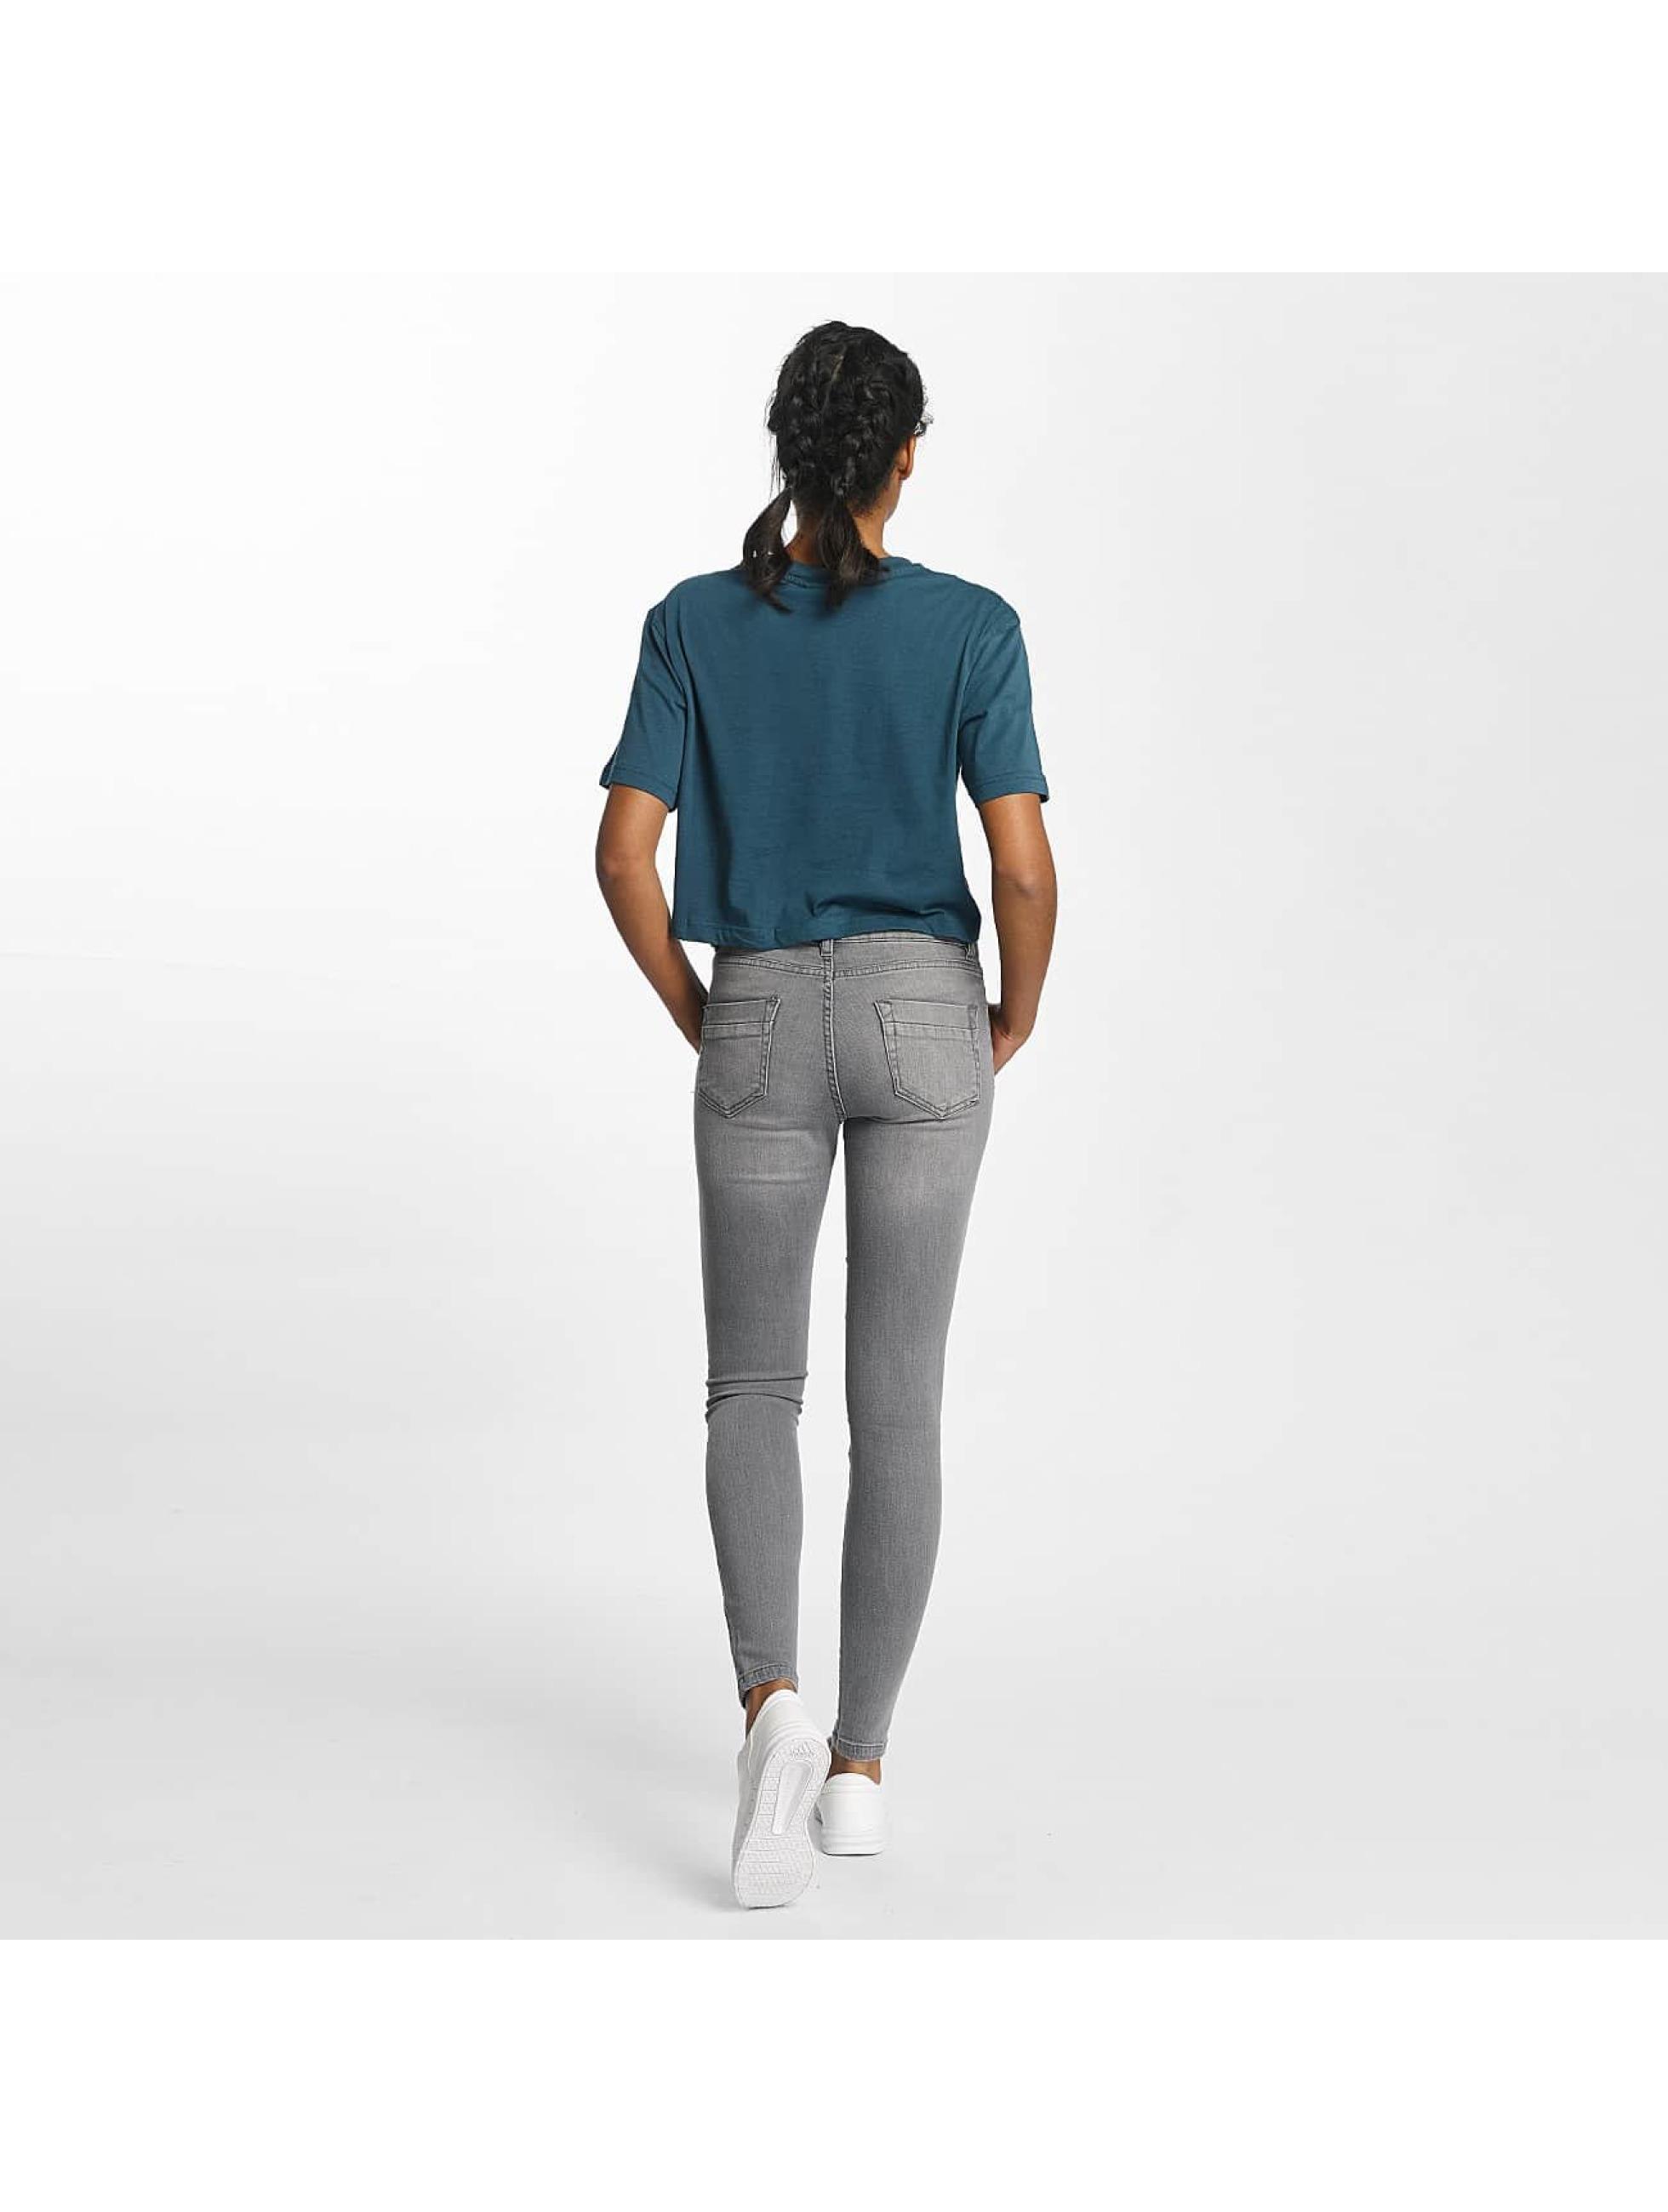 Urban Classics t-shirt Ladies Oversized turquois